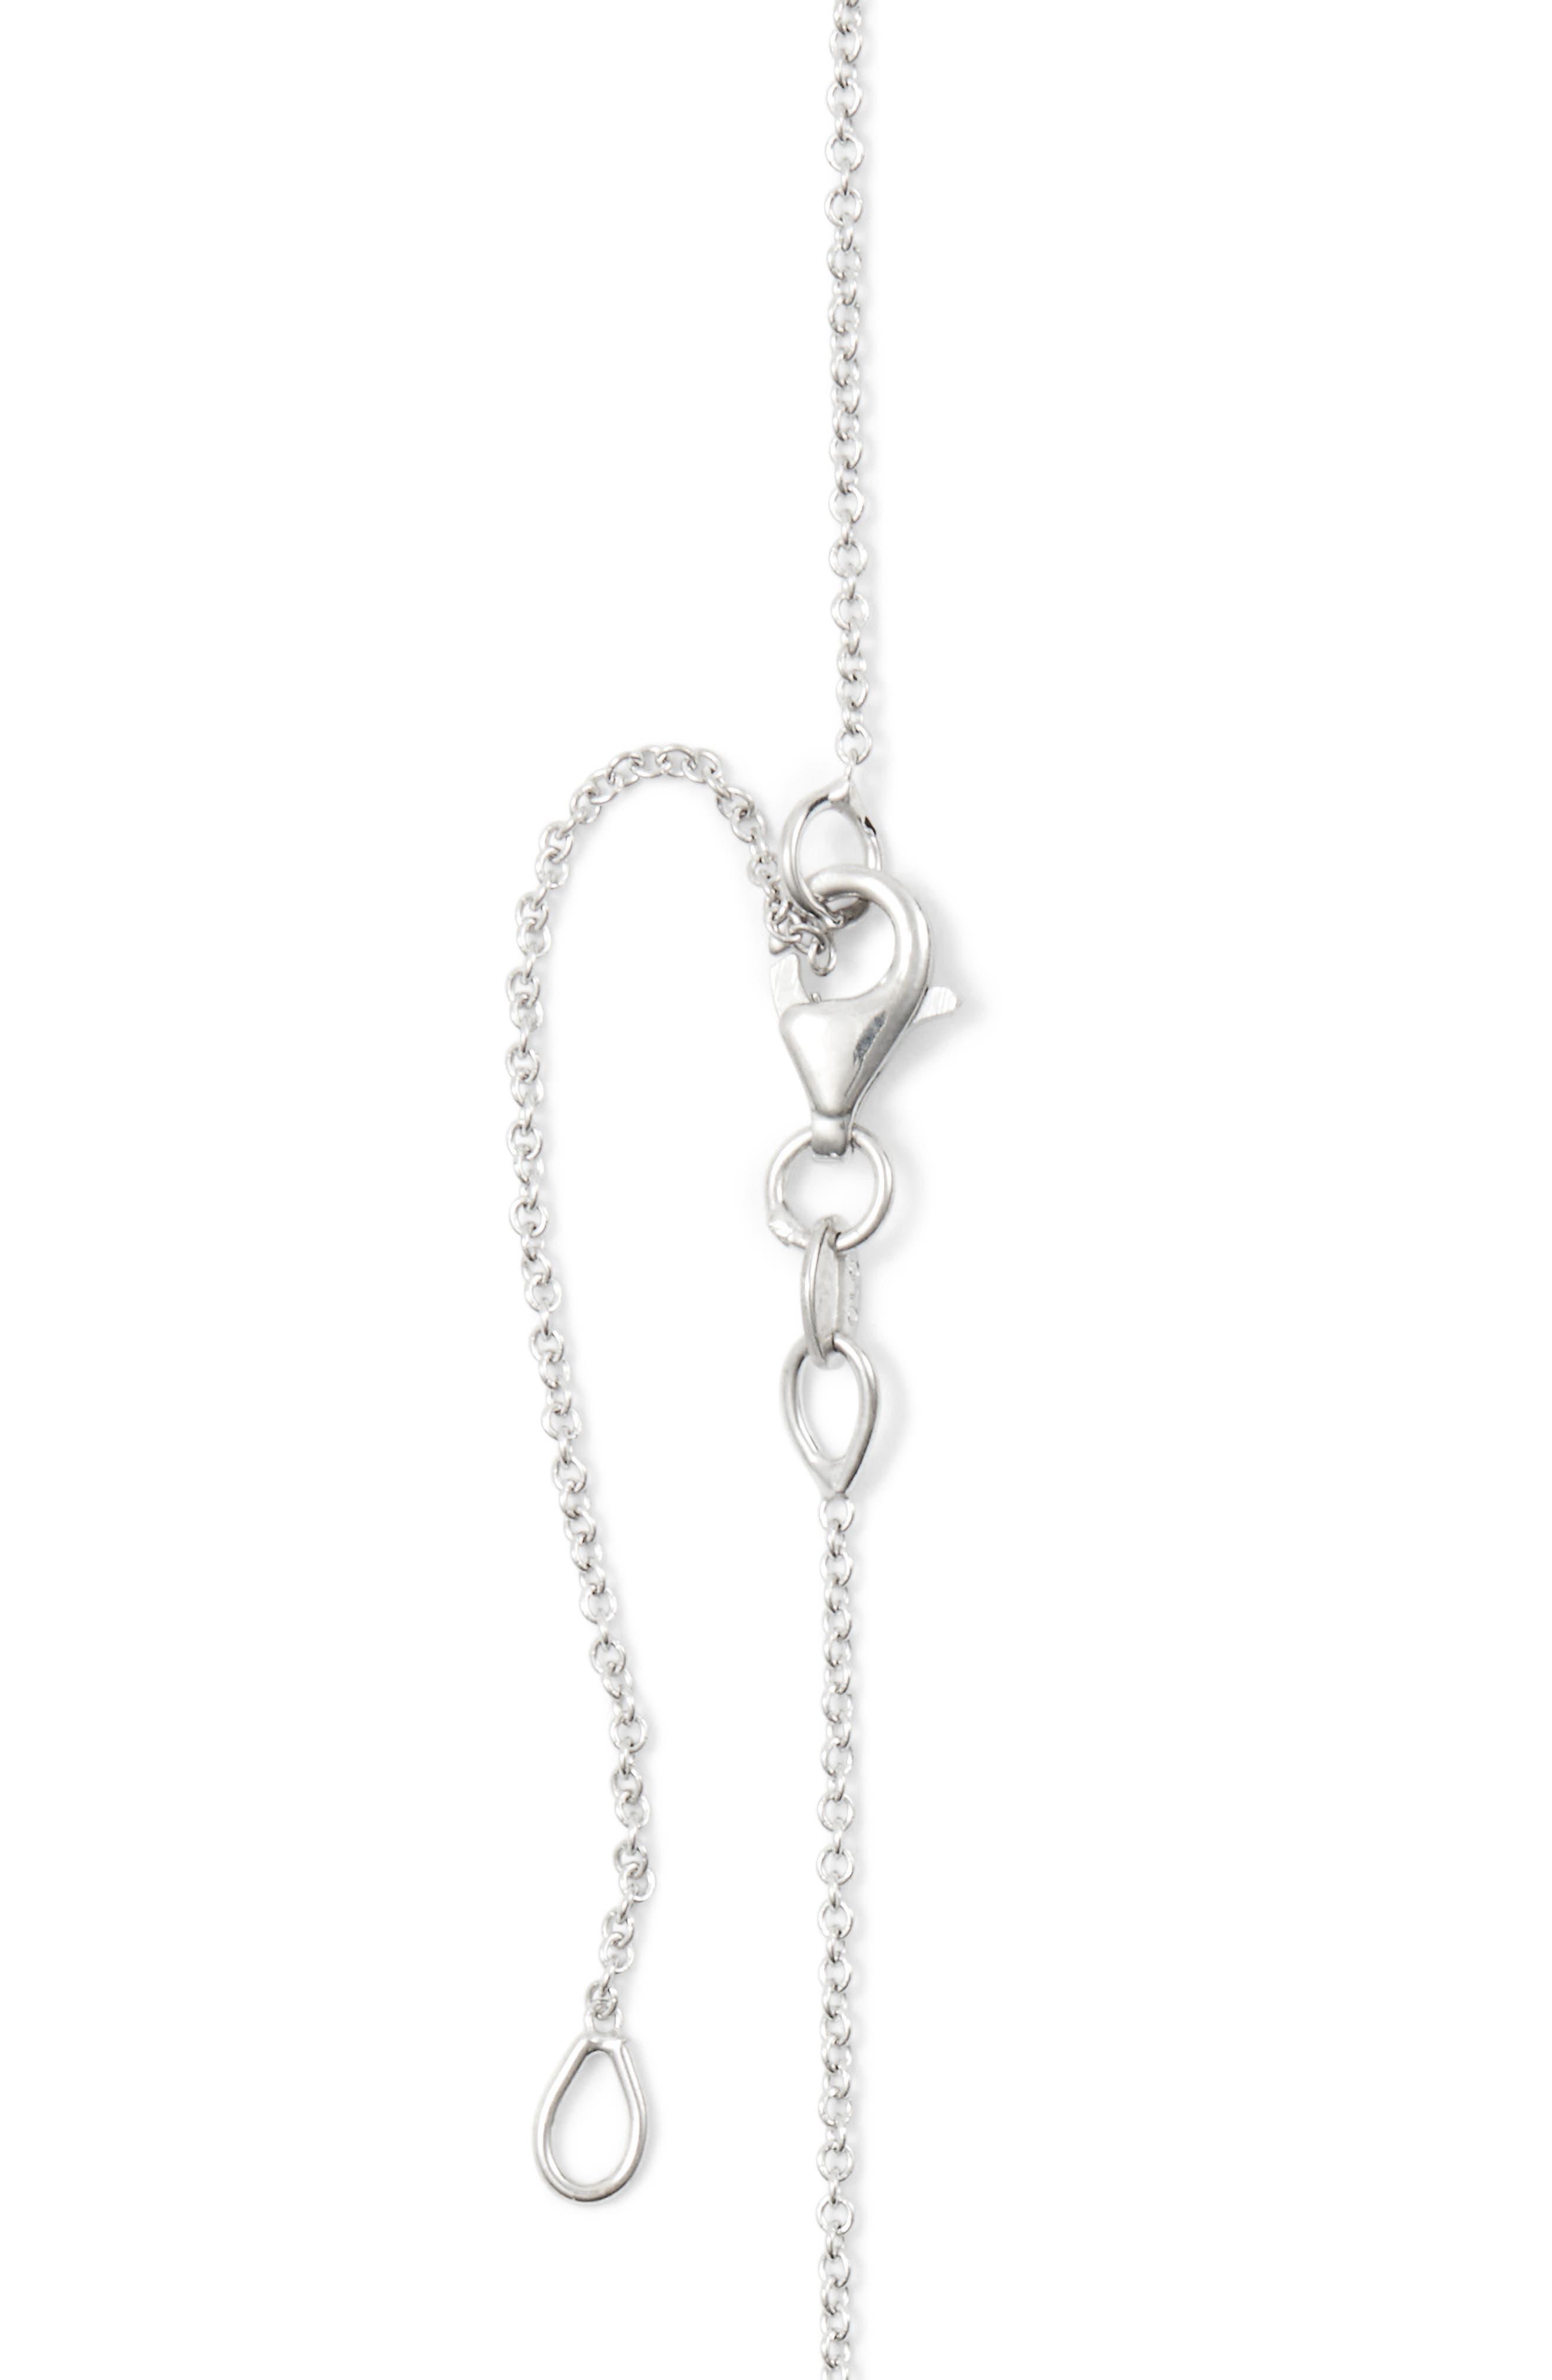 18k Gold Pavé Diamond Initial Pendant Necklace,                             Alternate thumbnail 5, color,                             White Gold - A